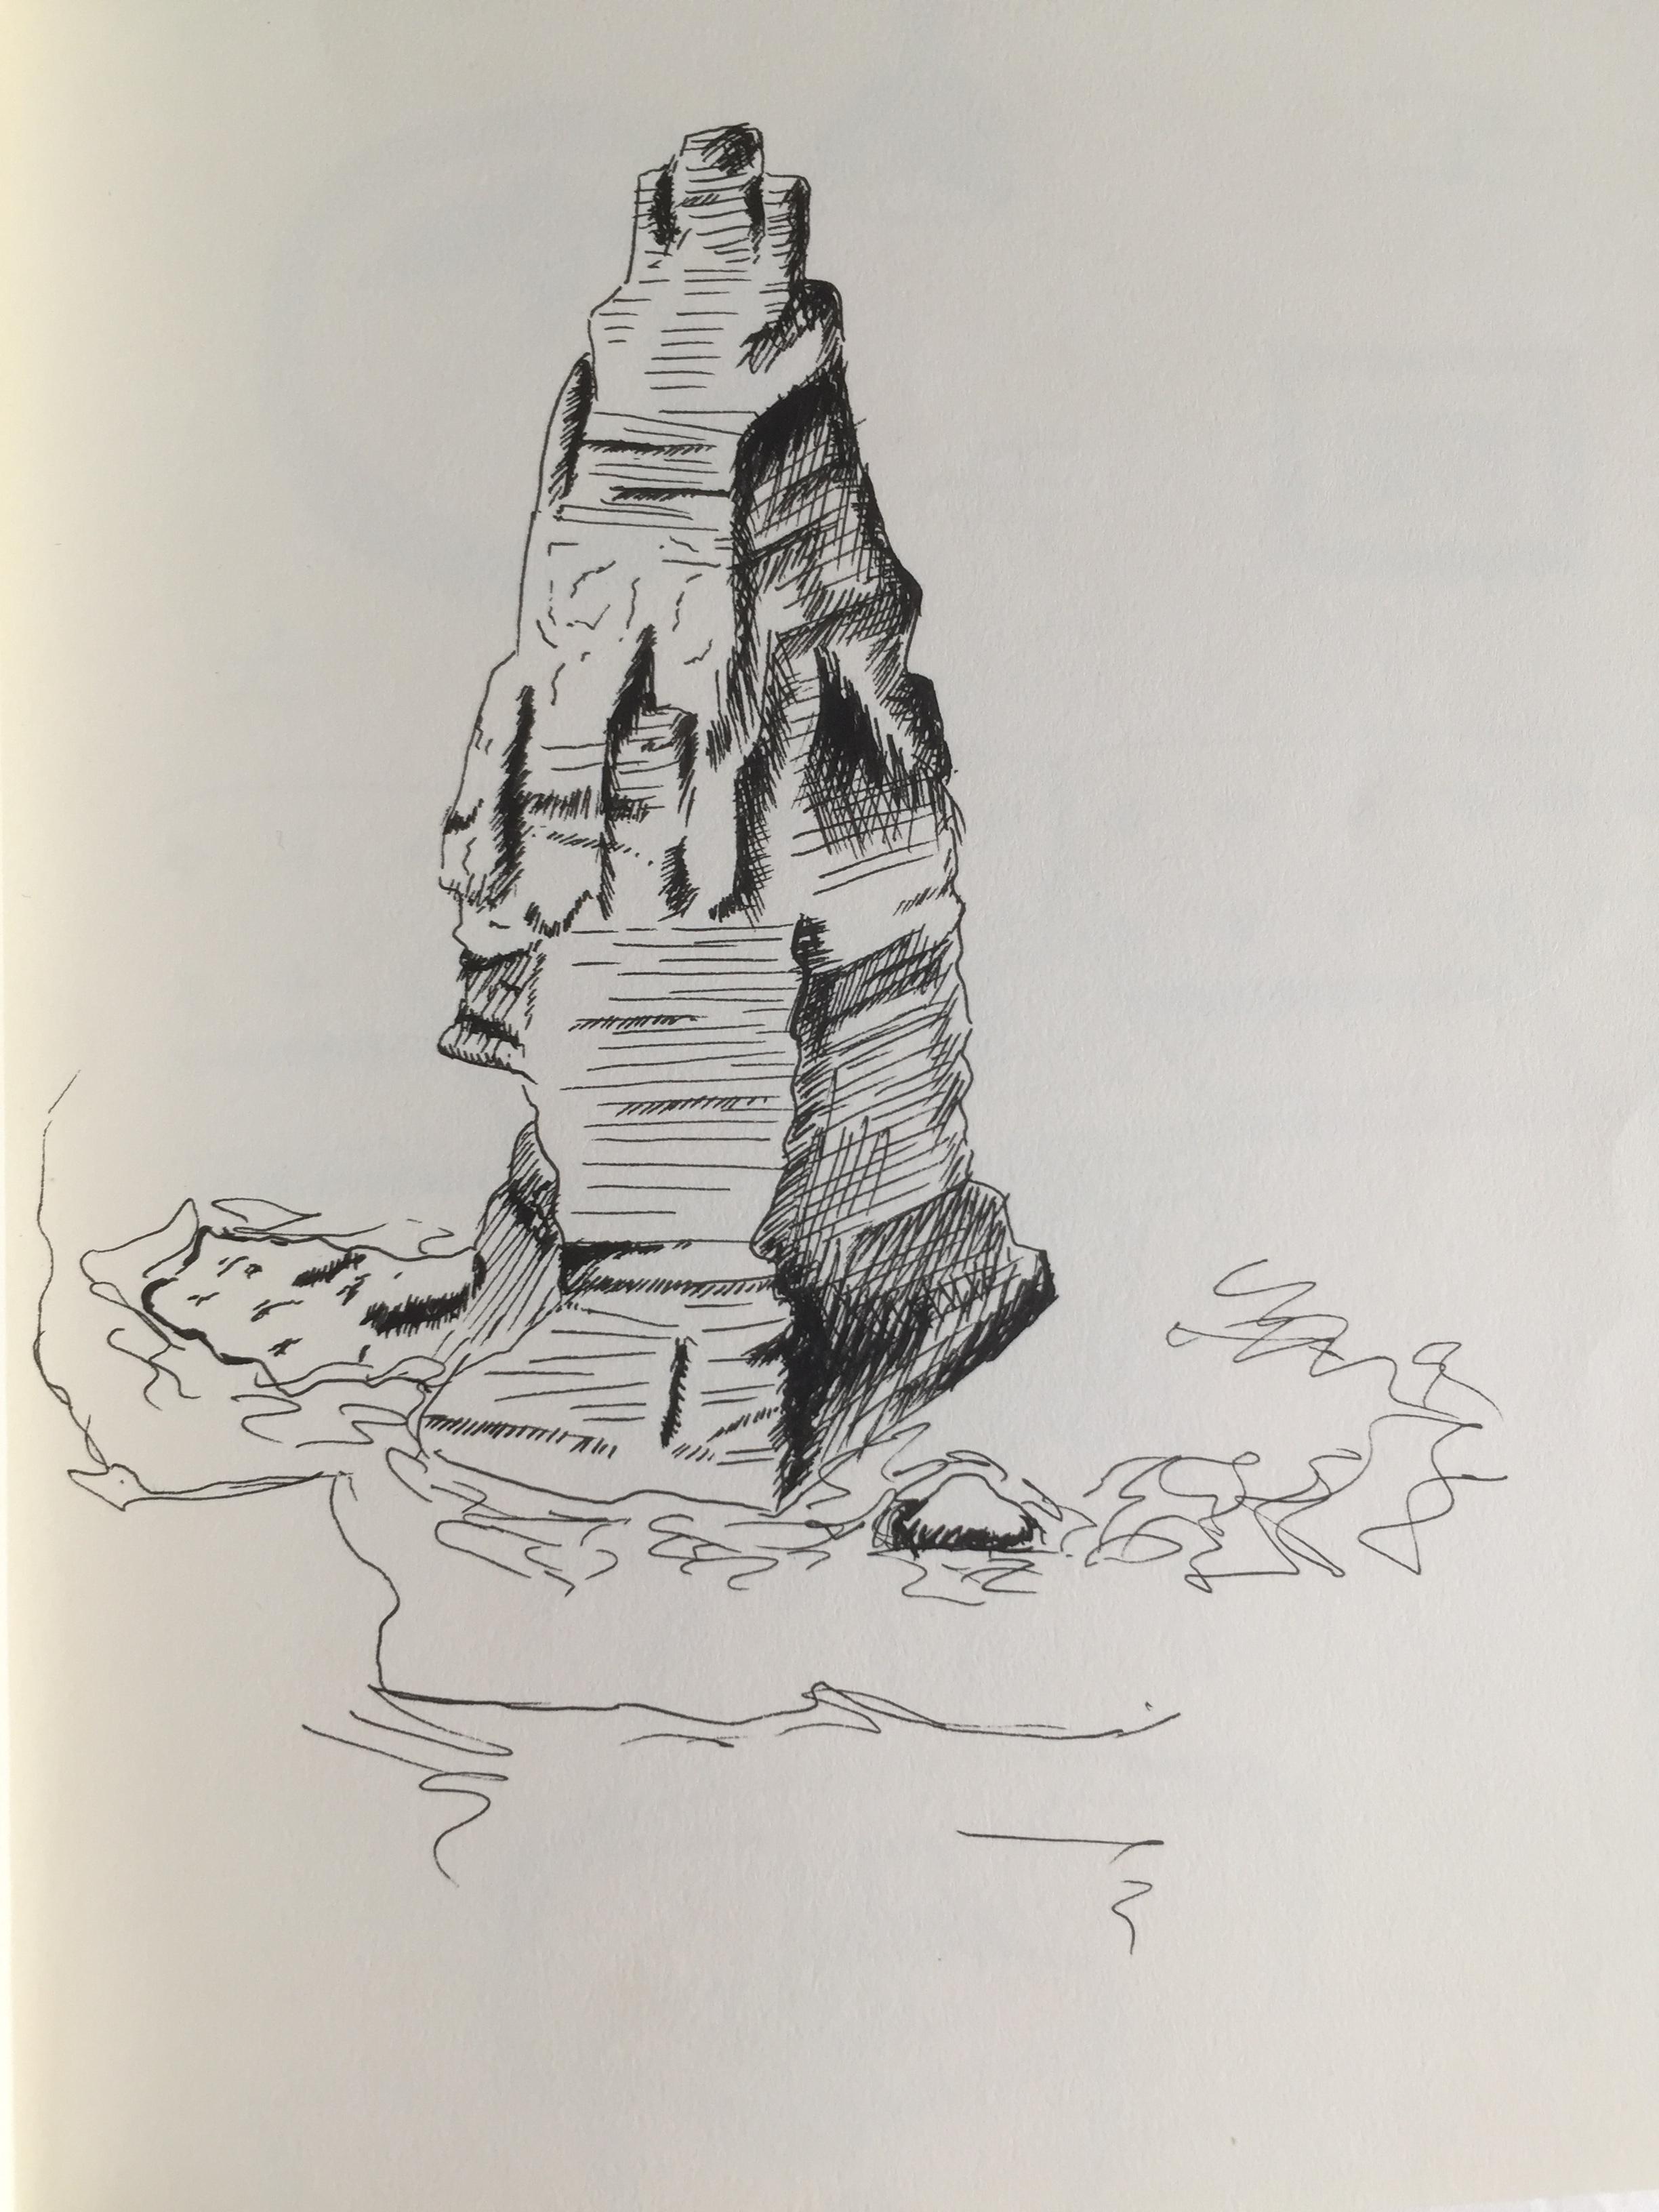 Cliffs of Moher, Ireland, Black Pens